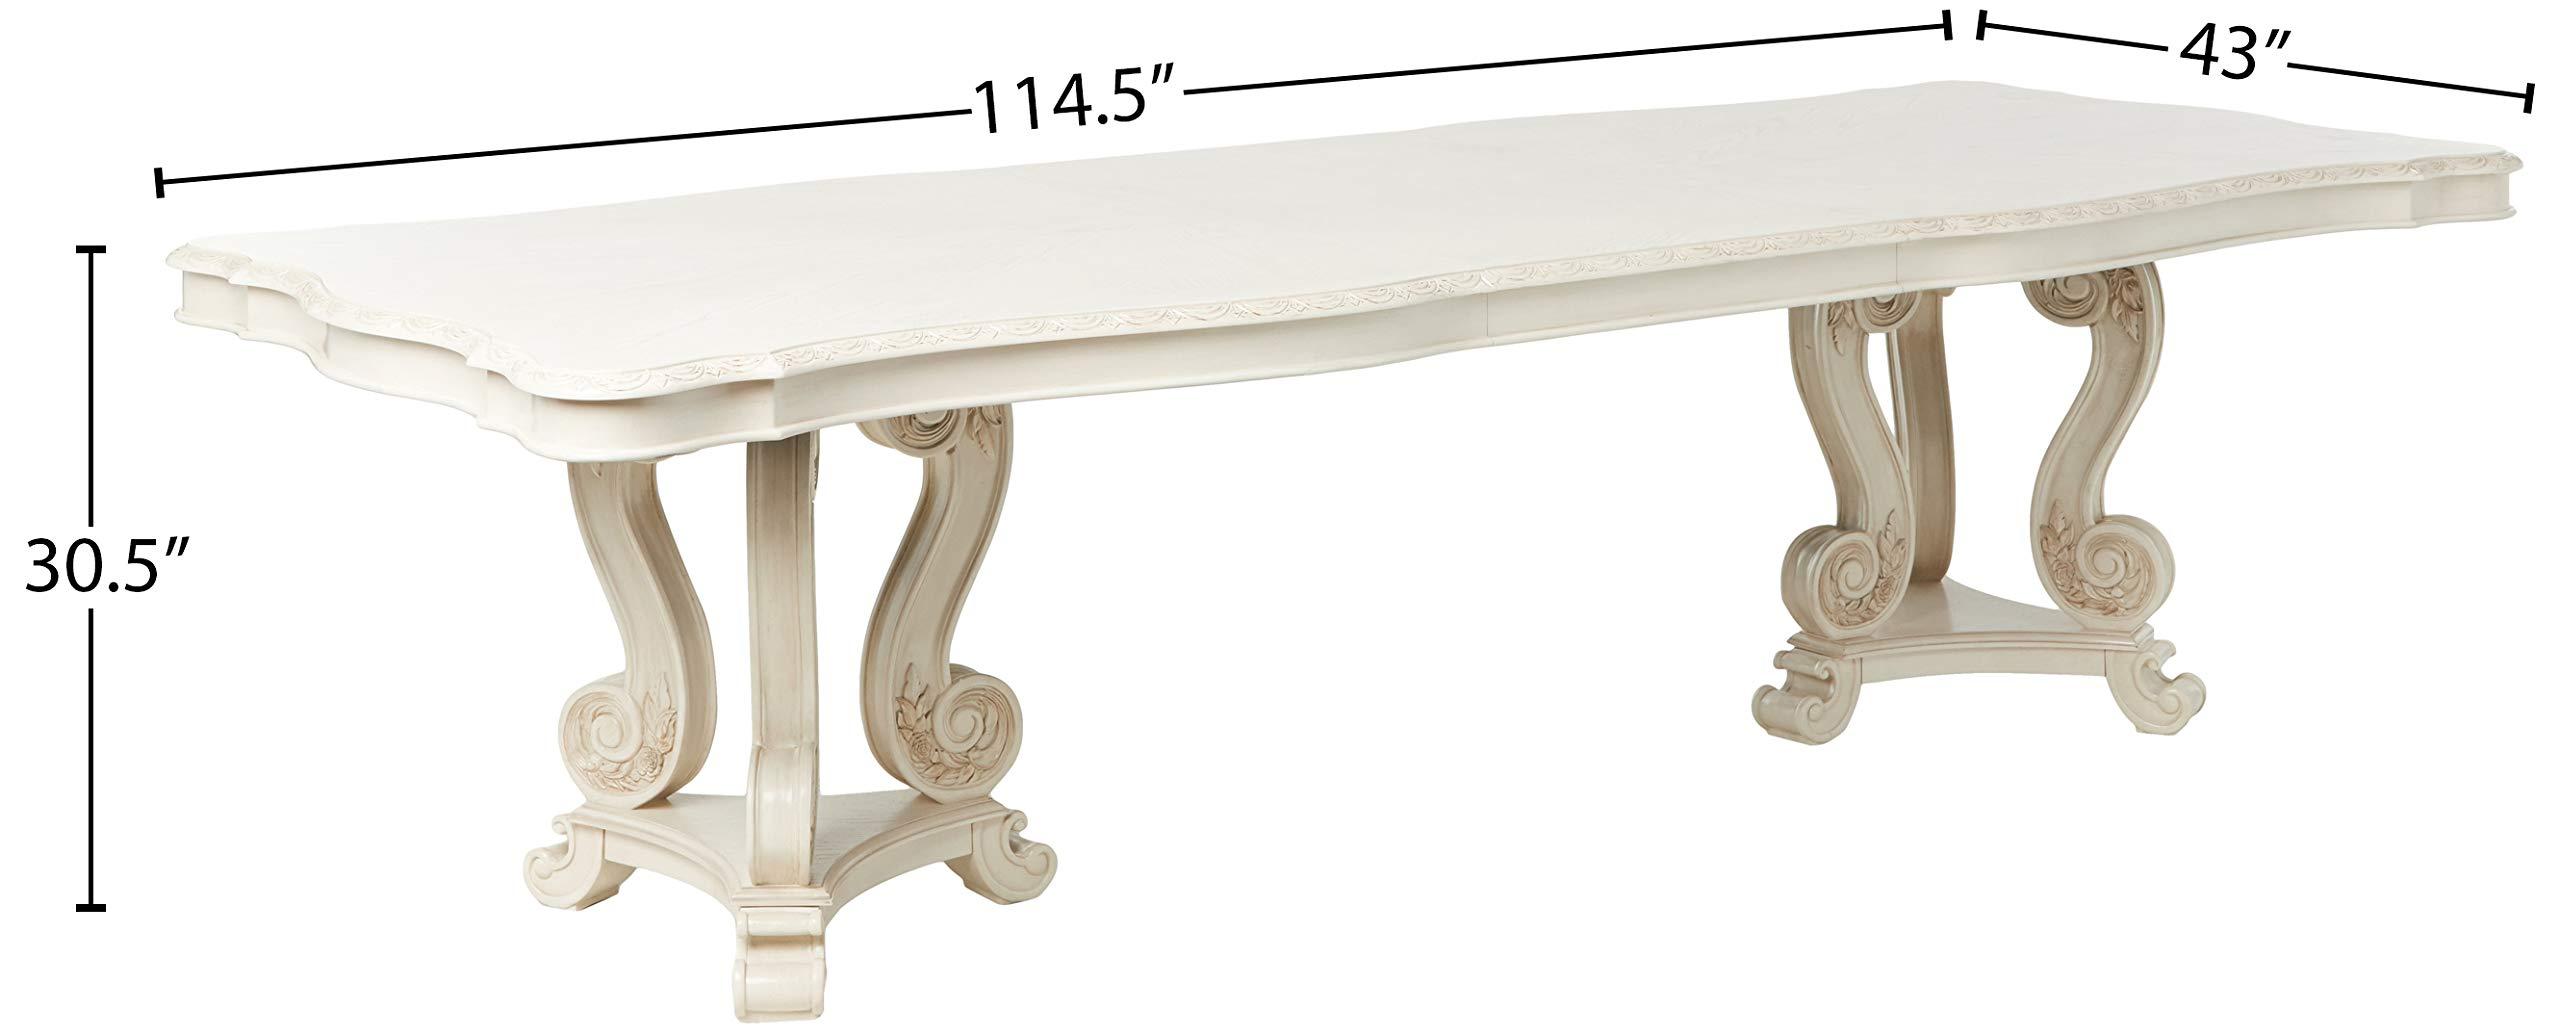 Amazon Com Acme Furniture Ragenardus Double Pedestal Dining Table Antique White Buffets Sideboards